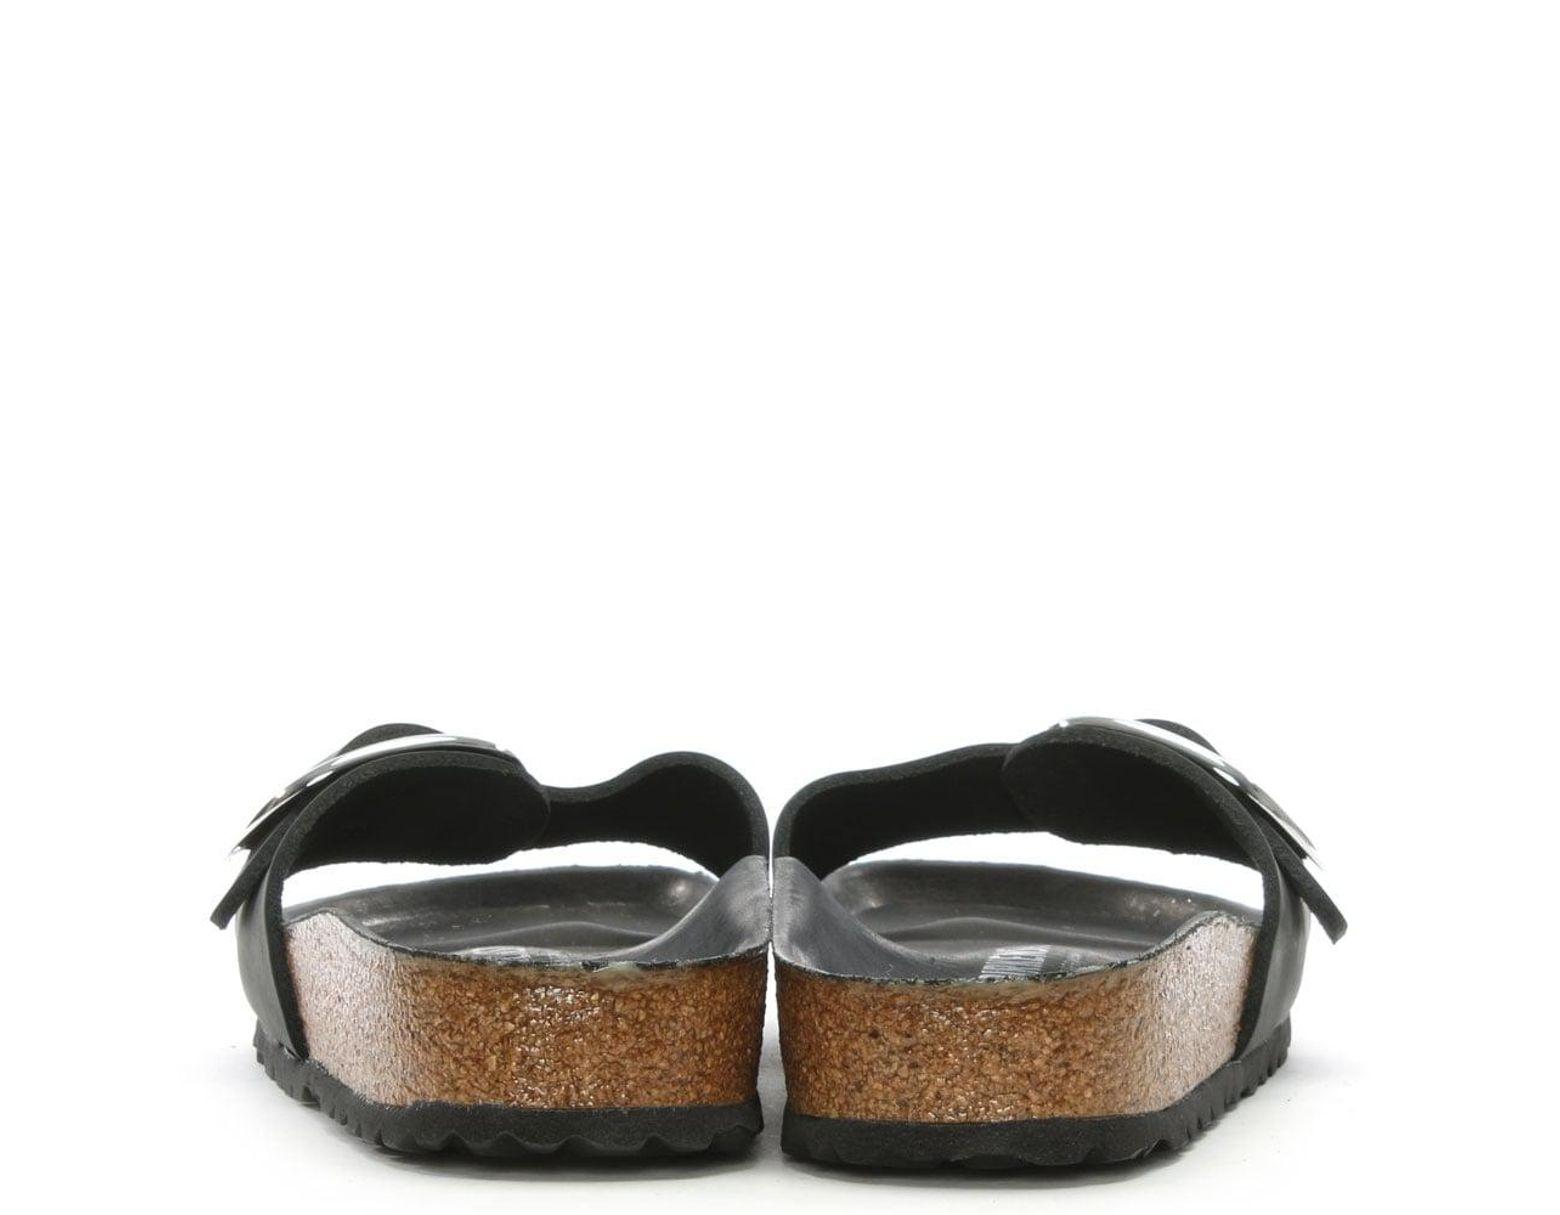 8e5a446ec3f Birkenstock Birkenstock Madrid Big Buckle Black Leather Mule in Black -  Save 3% - Lyst